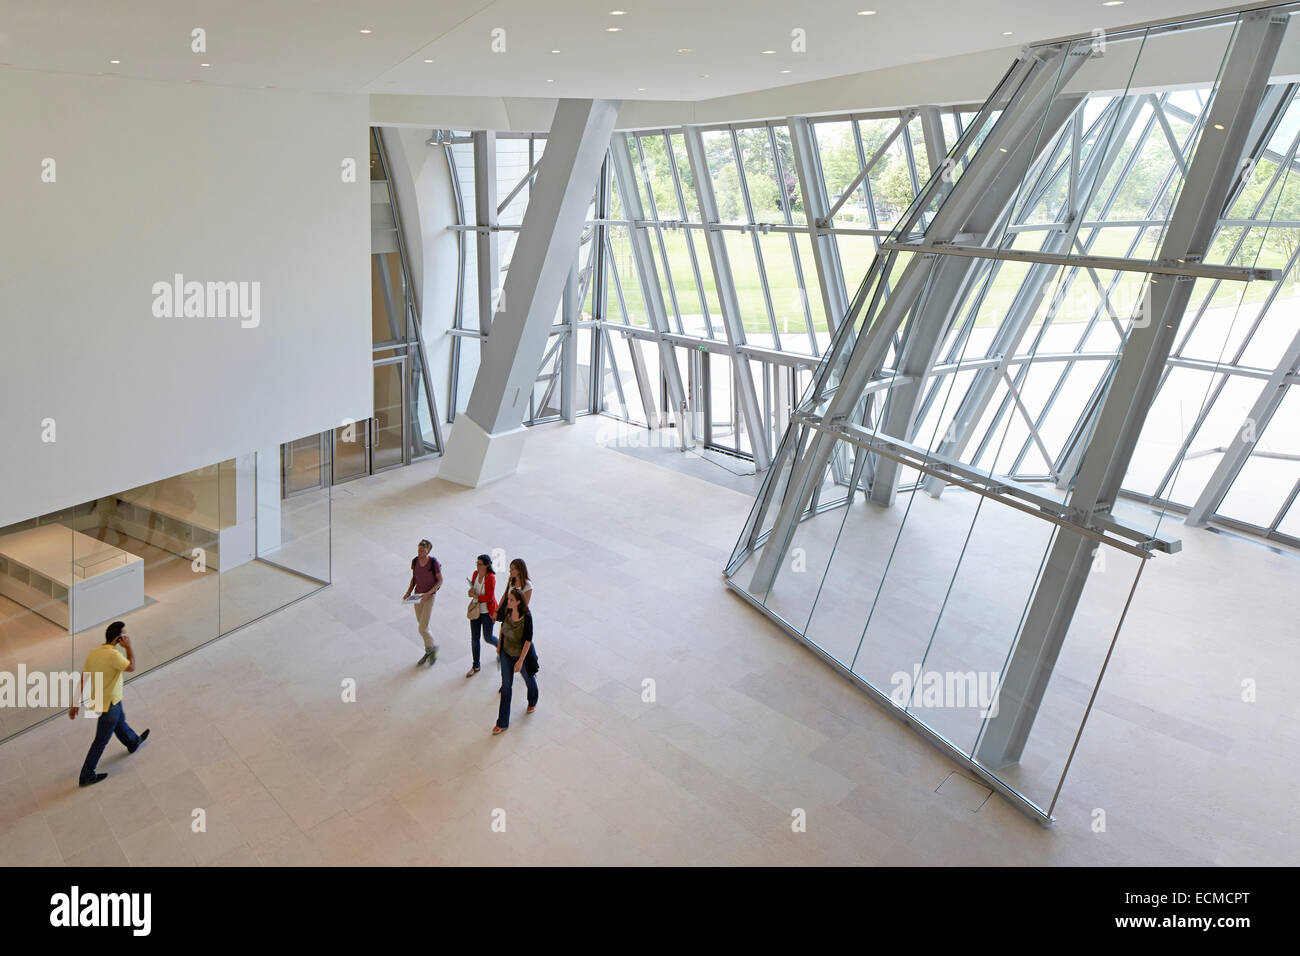 Fondation Louis Vuitton, Paris, France. Architect  Gehry Partners LLP,  2014. Ground level entrance hall. ff2af964304